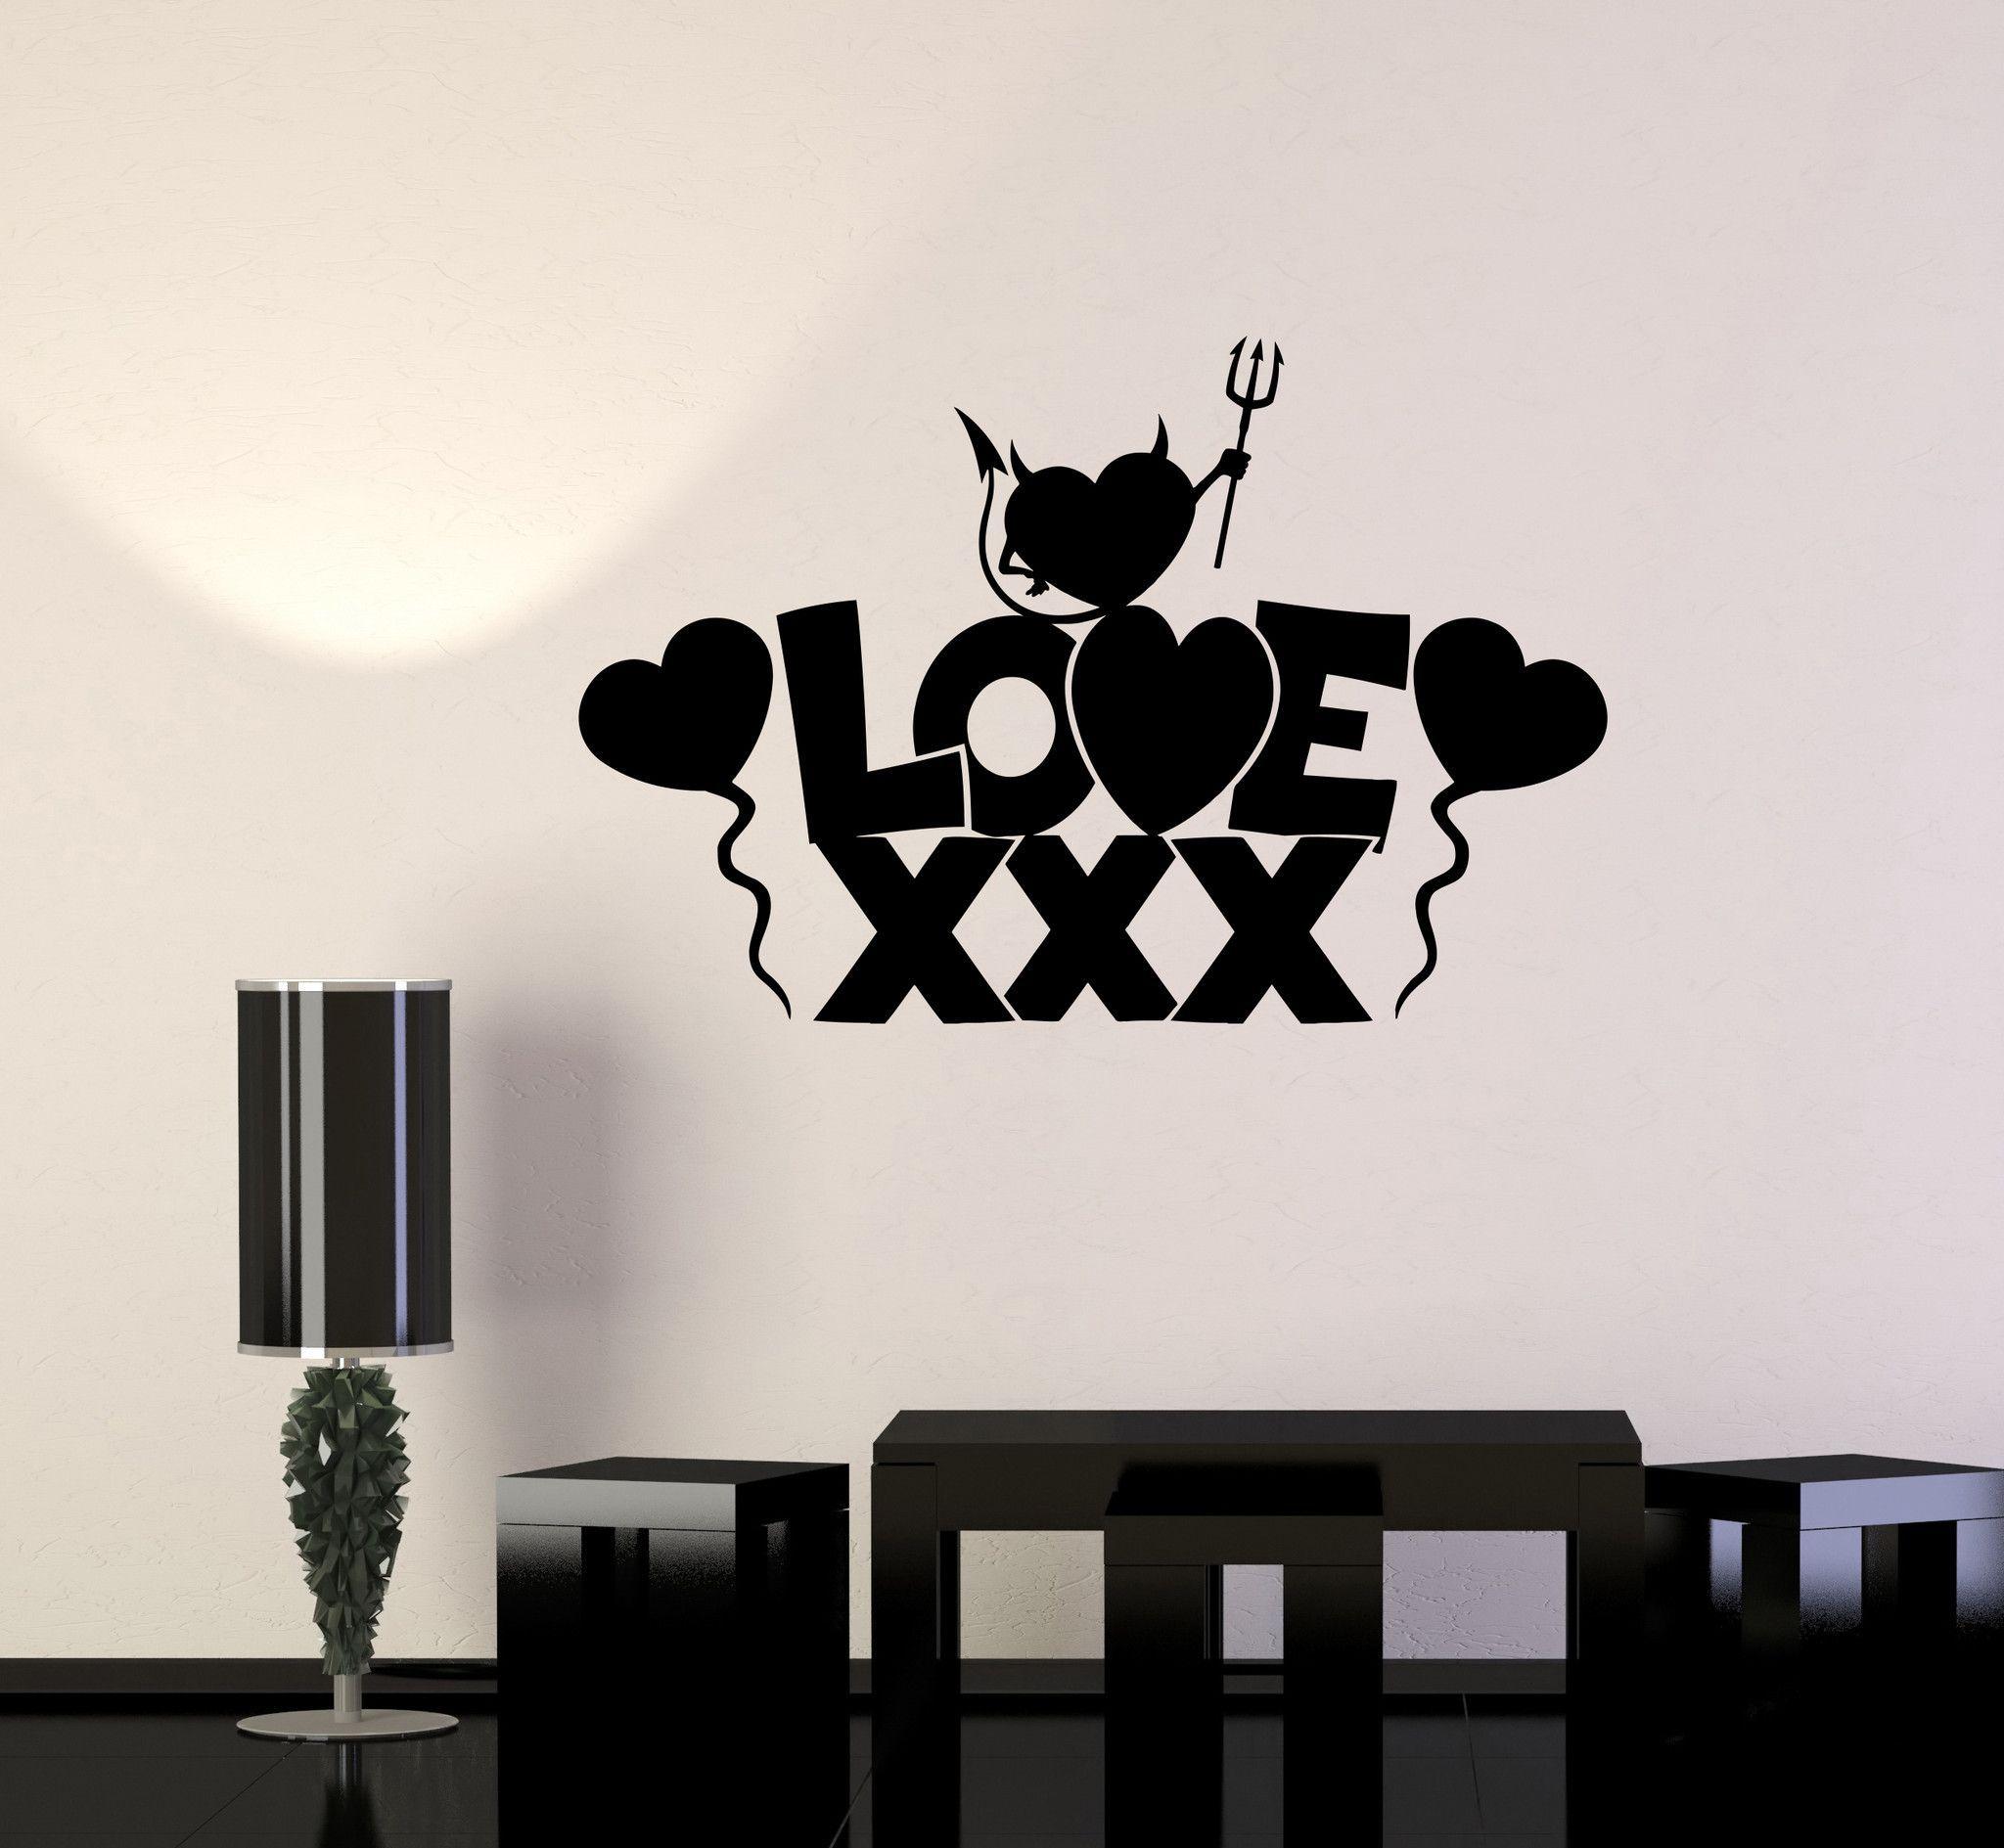 Vinyl Wall Decal Love Sex Shop Heart For Adults Sticker (660ig) & Vinyl Wall Decal Love Sex Shop Heart For Adults Sticker Unique Gift ...